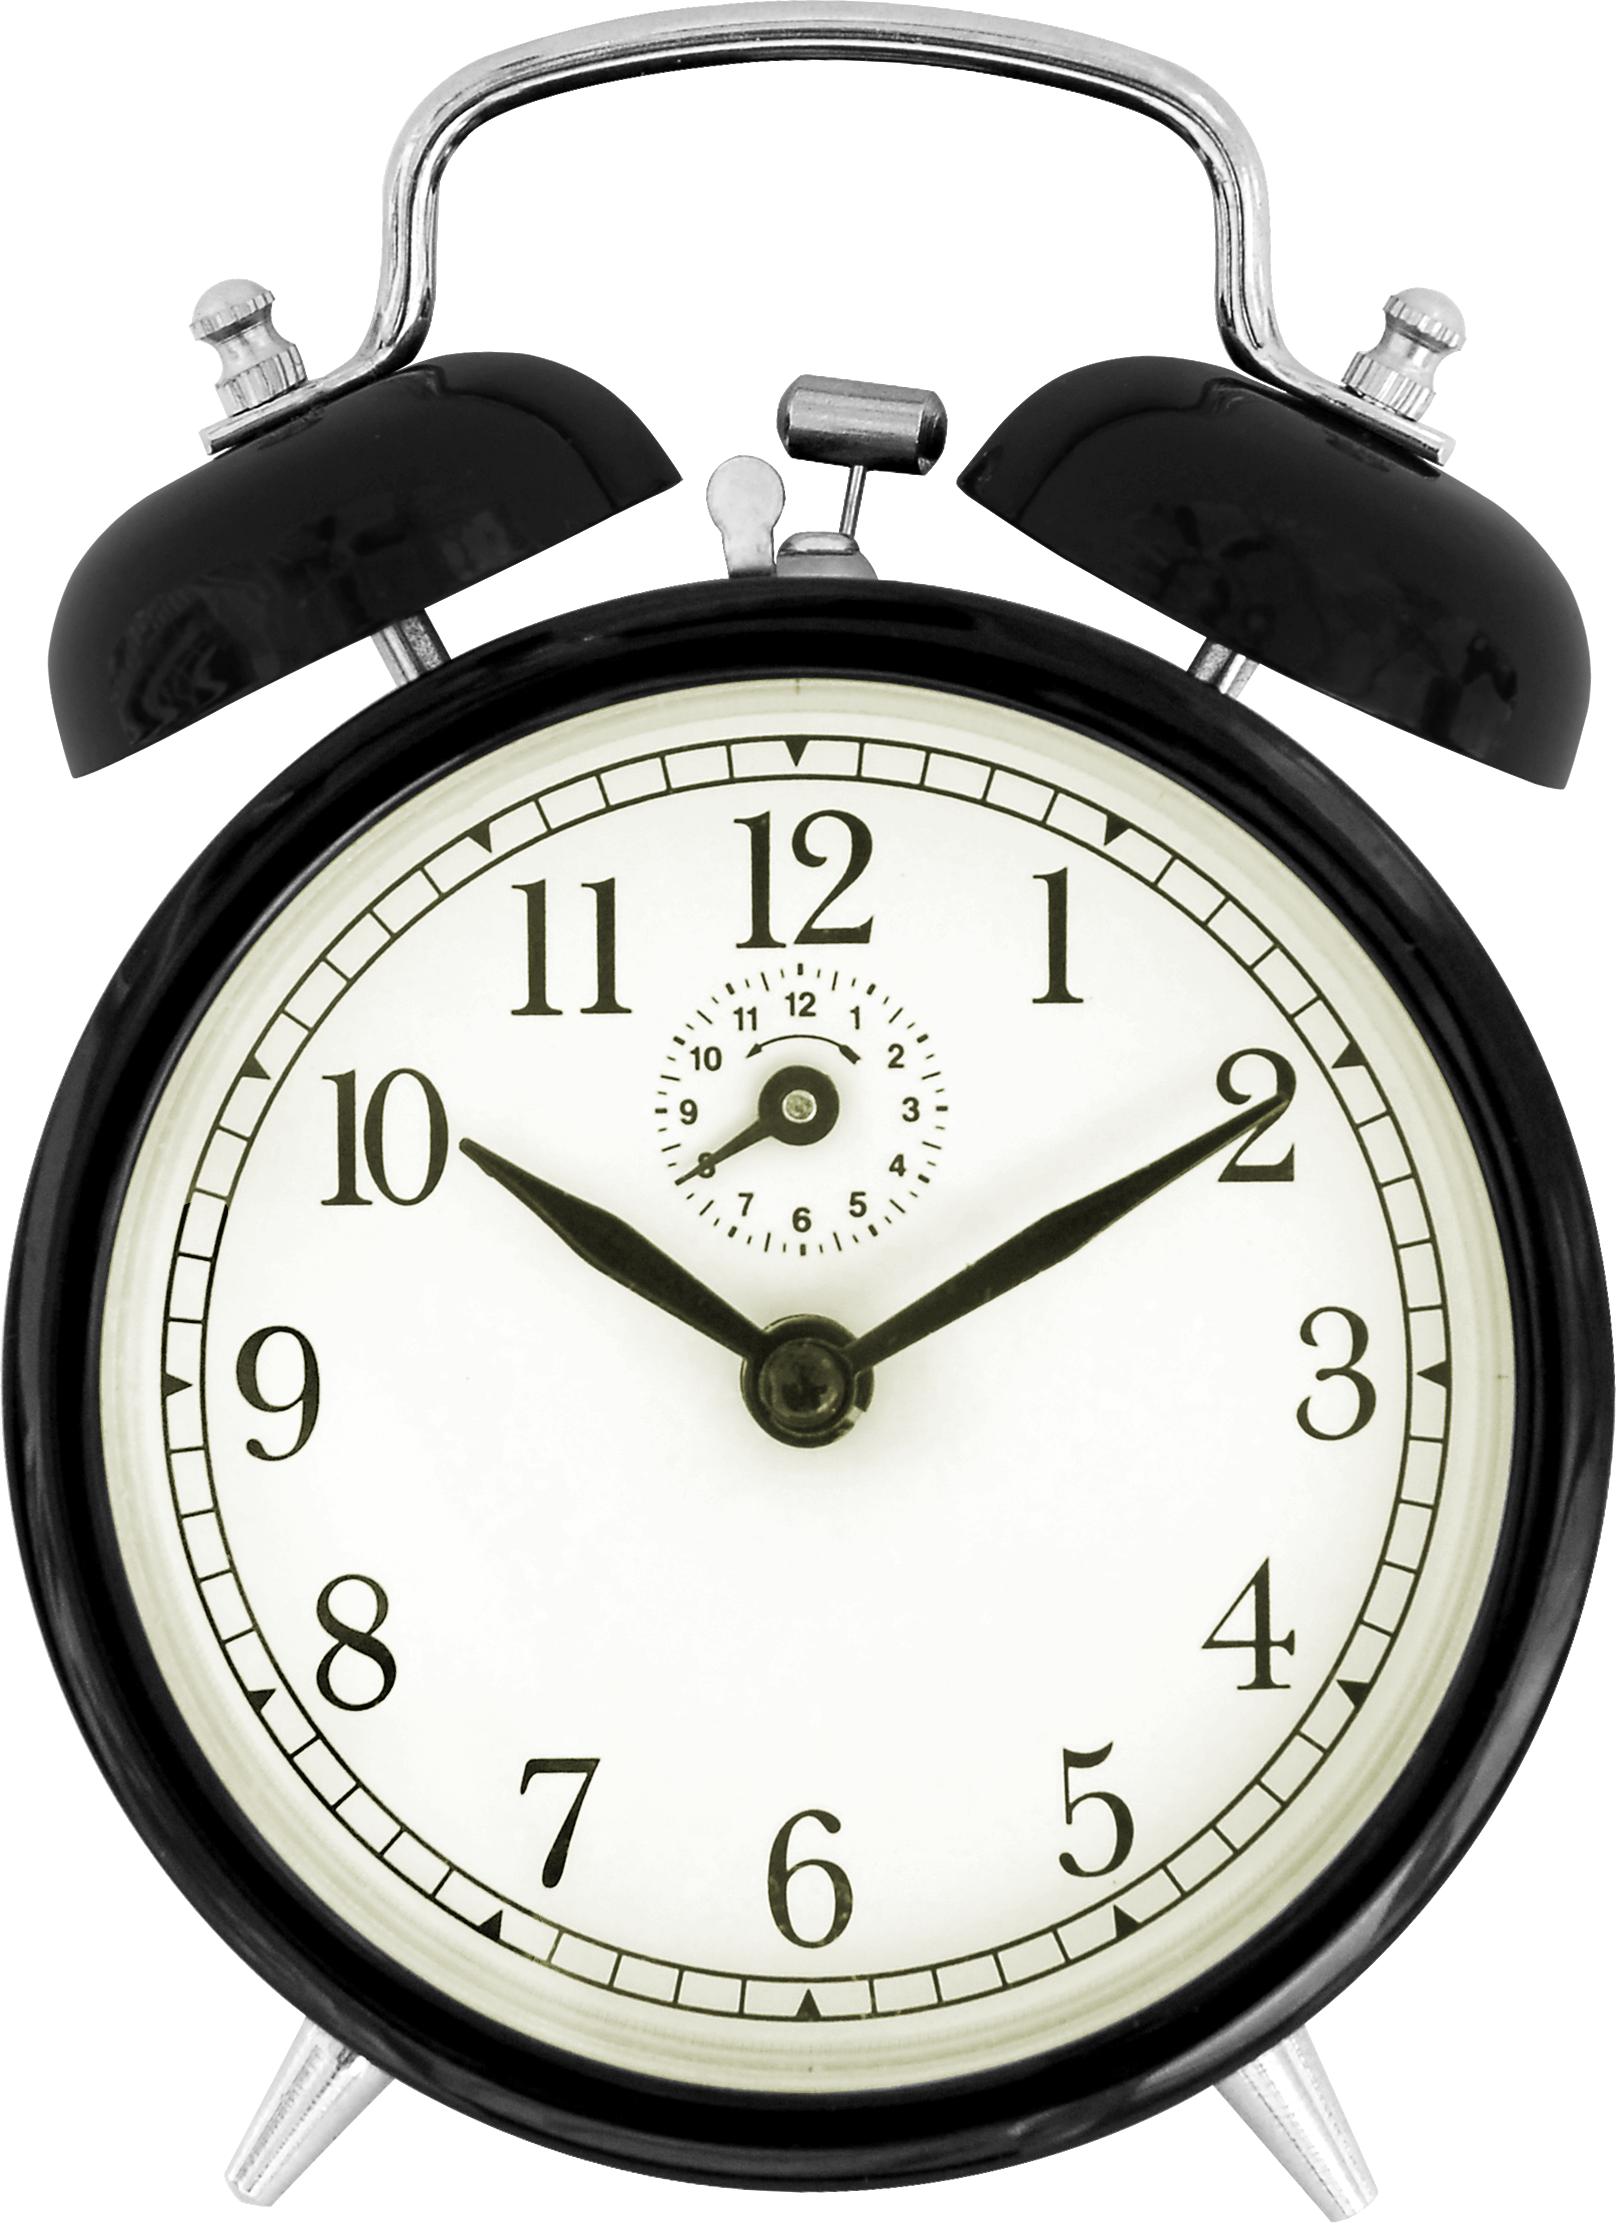 Alarm clock PNG images free download.